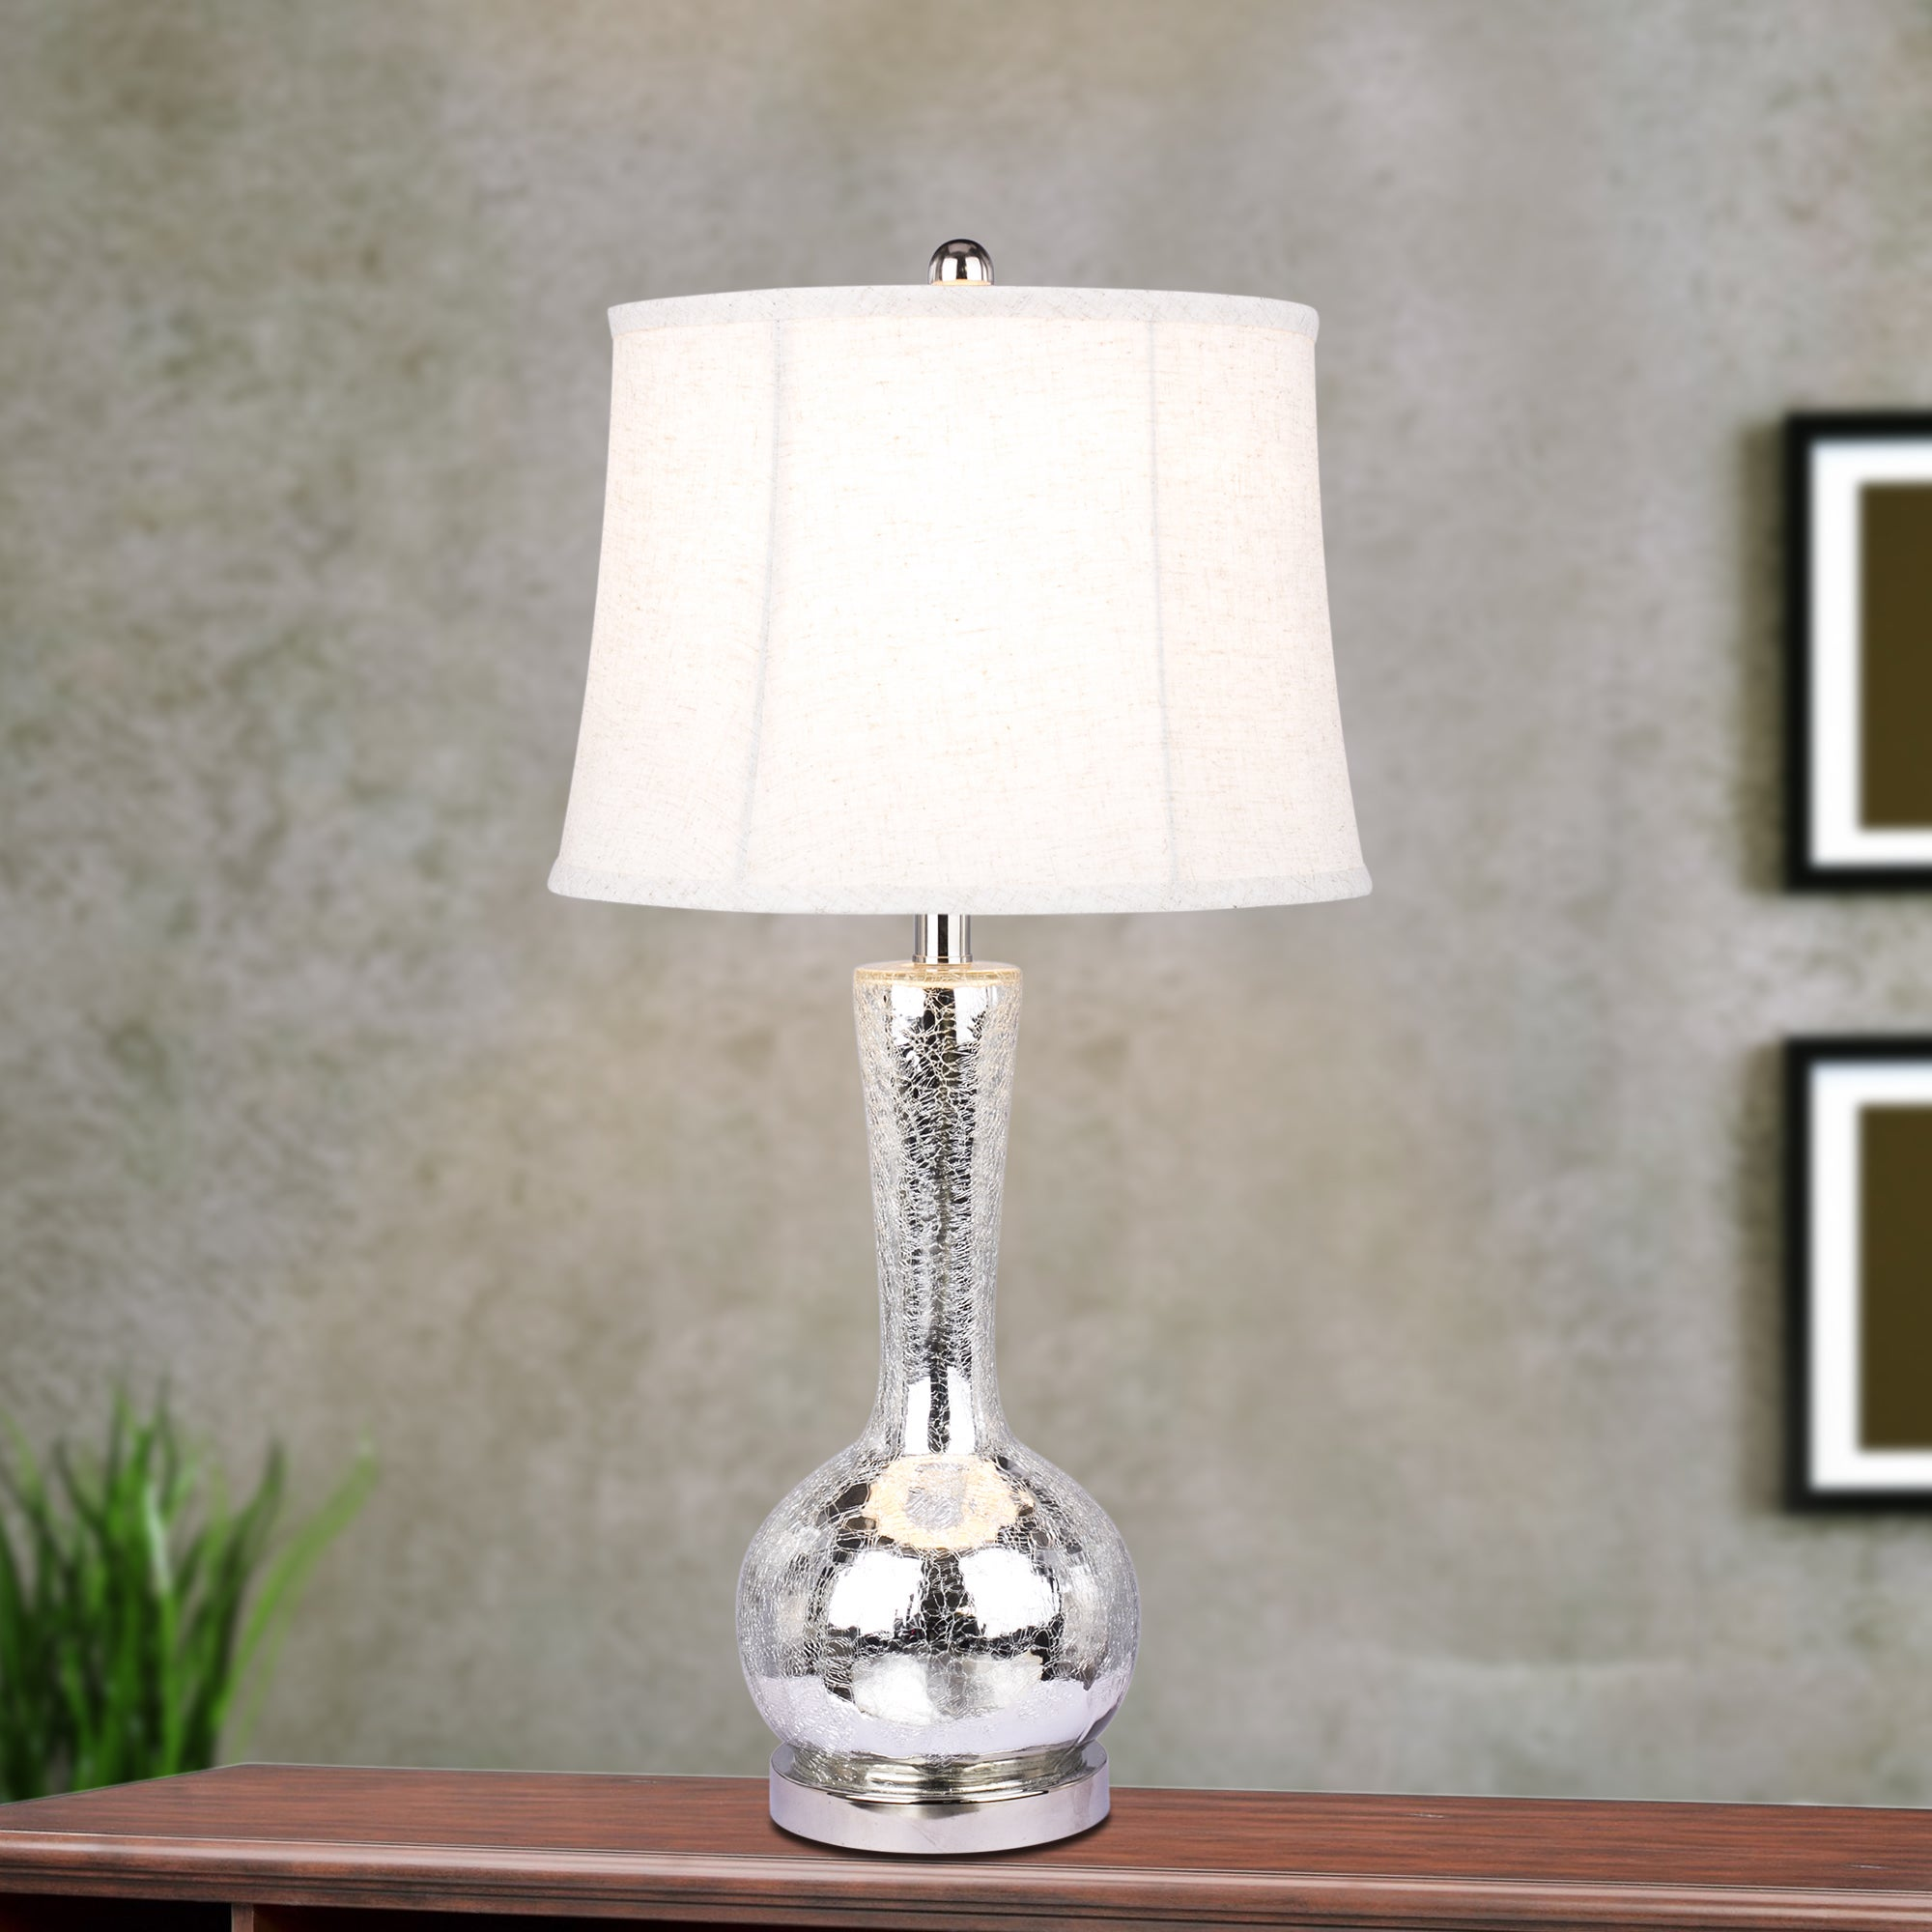 #5140 Modern 27.5 inch Silver Mercury Glass Table Lamp wi...